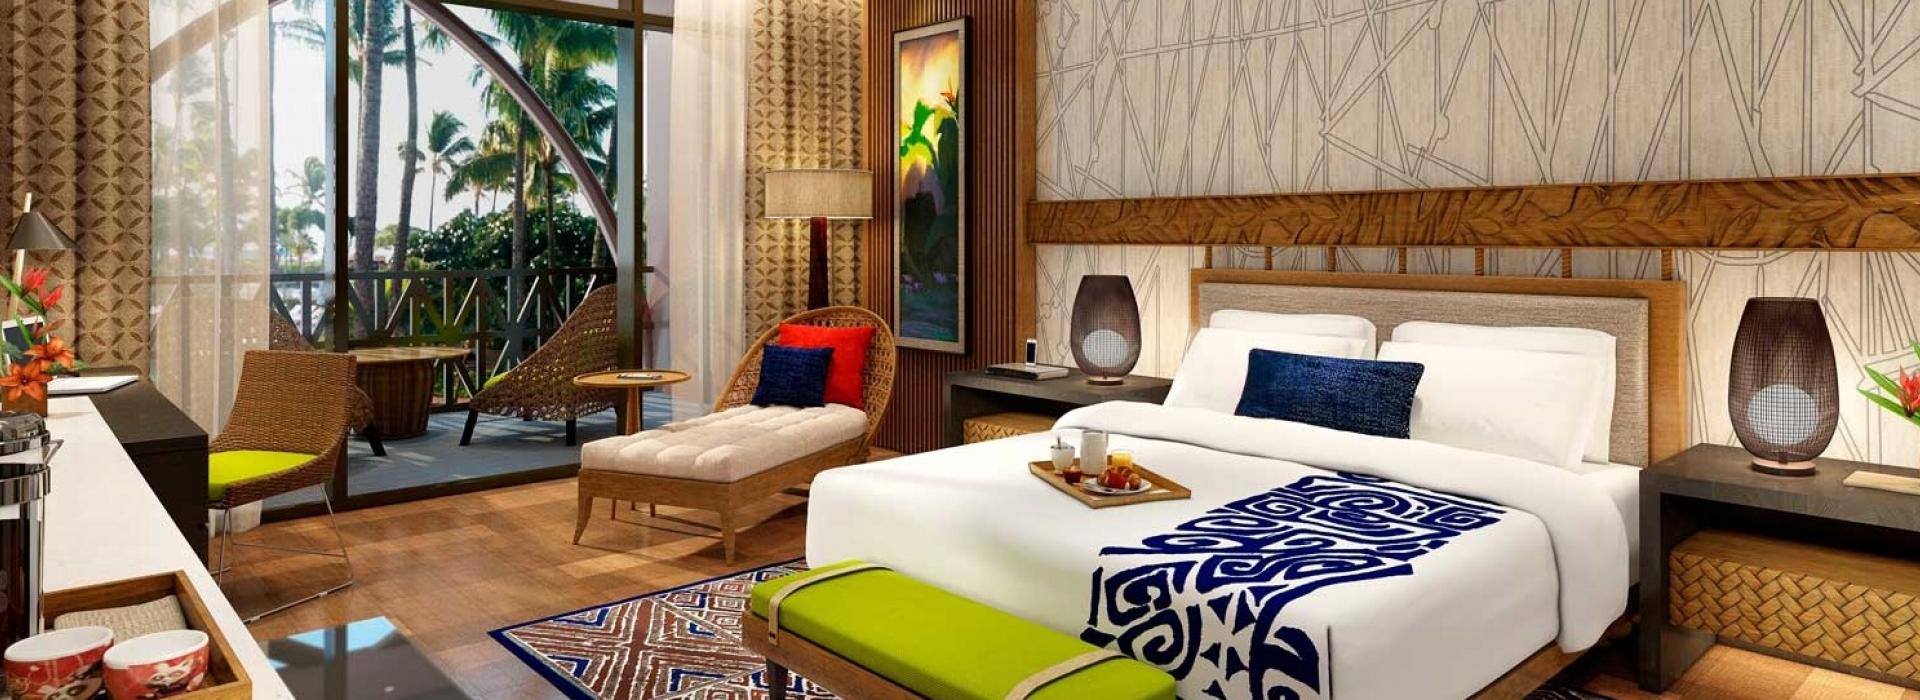 Lapita 4* Dubai Parks and Resorts